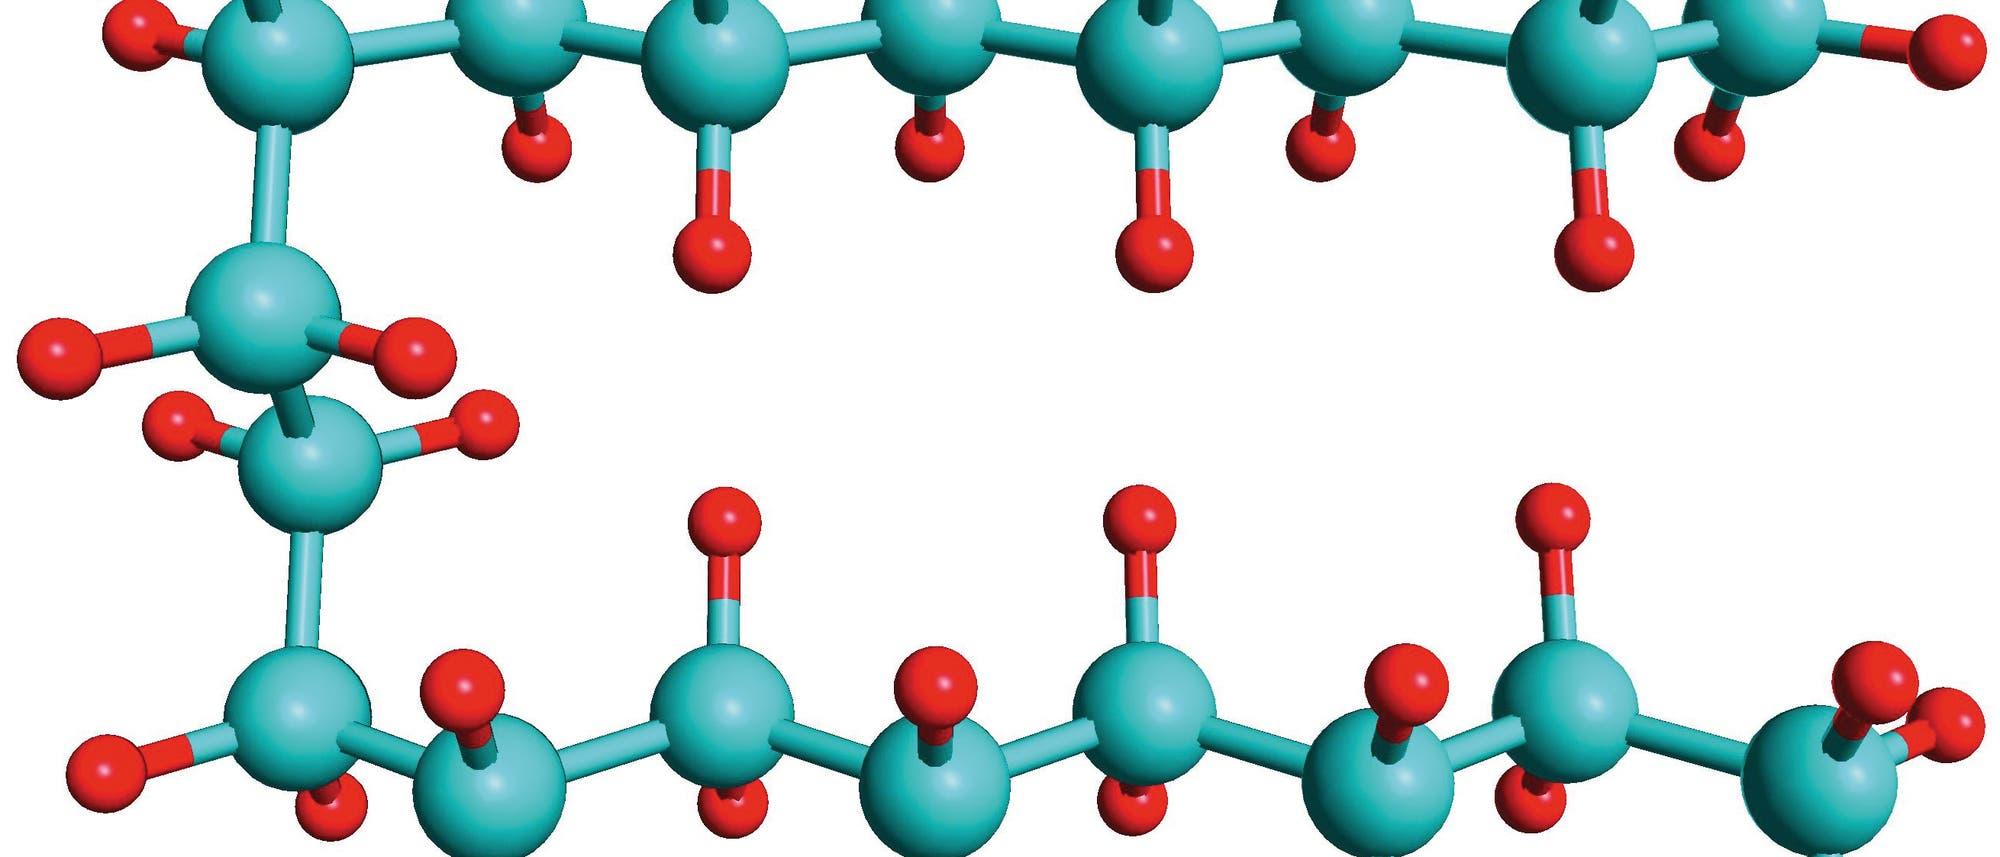 Haarnadelförmig gebogene Kohlenwasserstoffkette